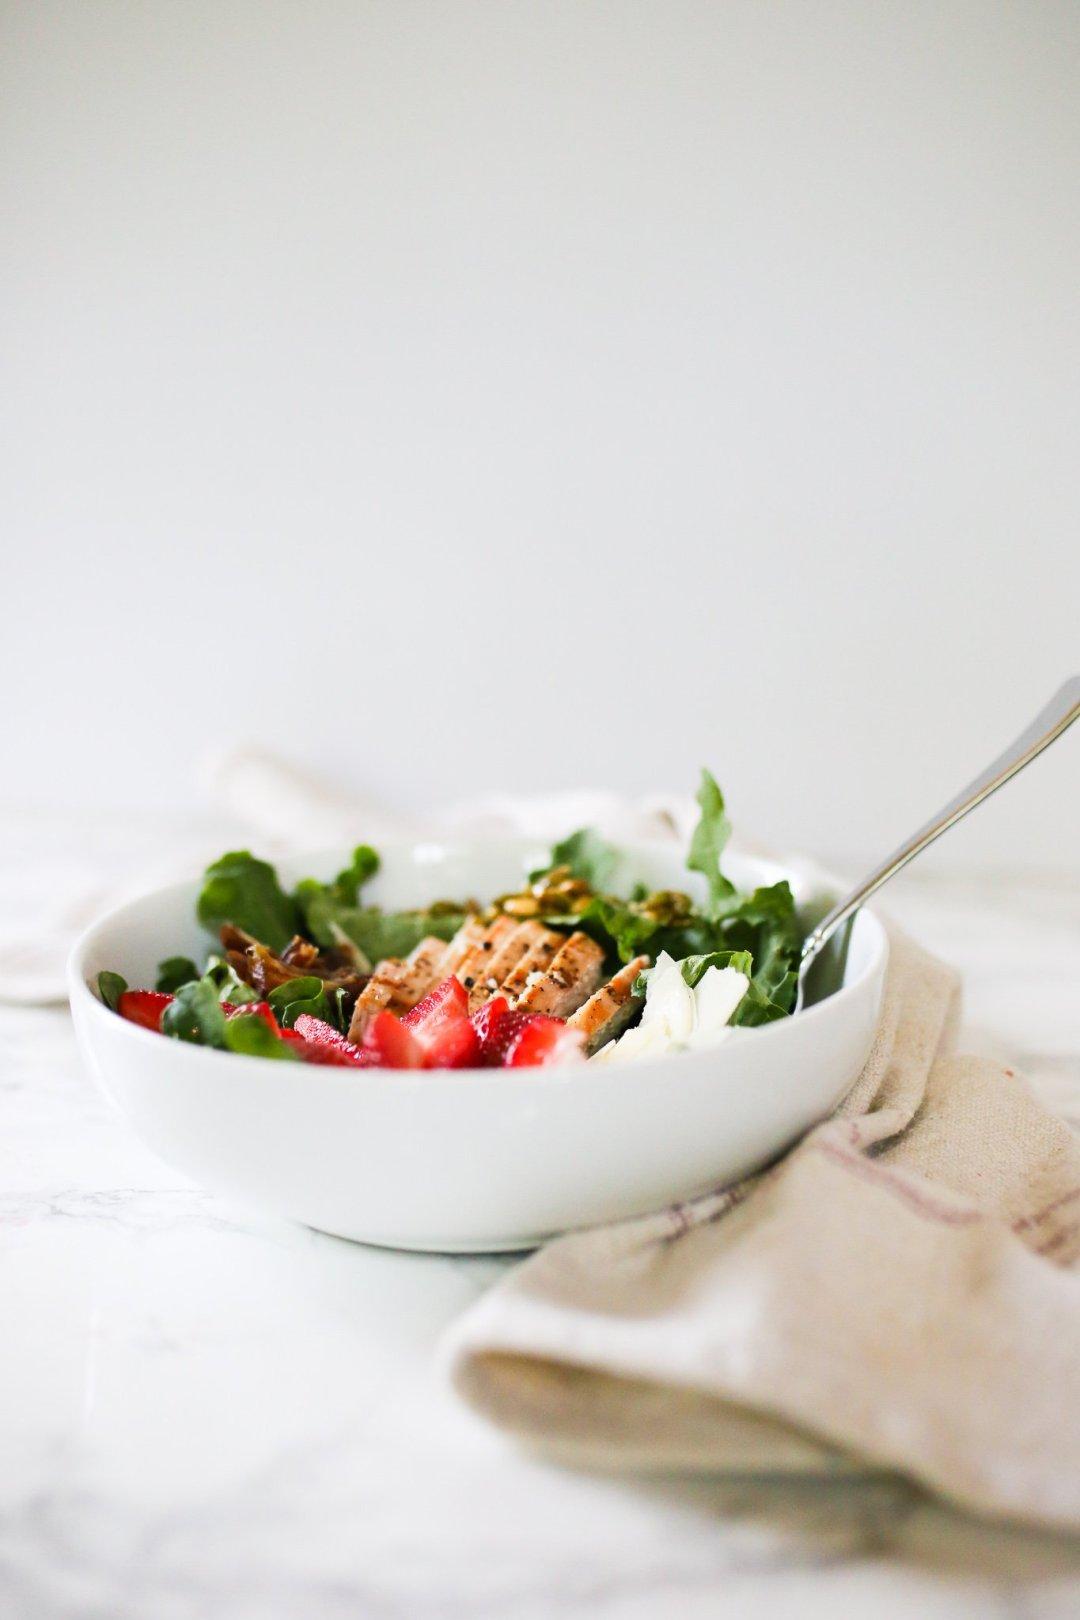 Kale Salad with Strawberries, Caramelized Pepitas, Dates & Pecorino Romano